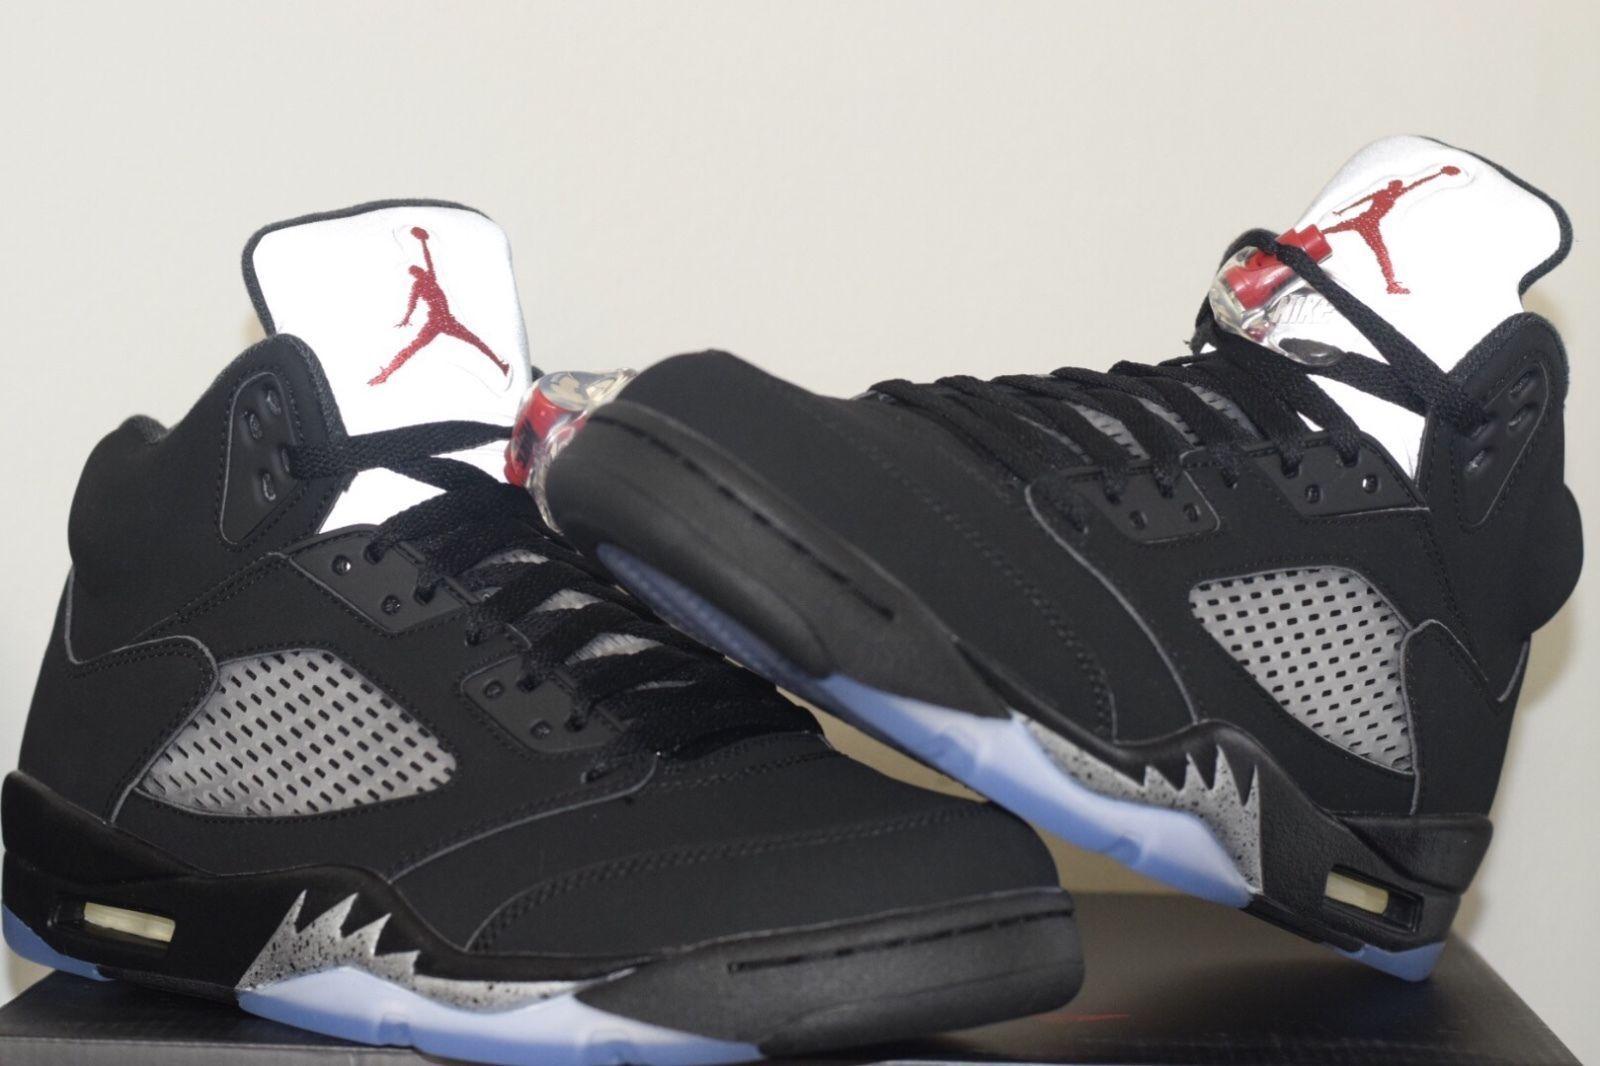 ae004c95287 2016 Nike Air Jordan 5 V Retro OG Black Metallic Silver Size 11 ...